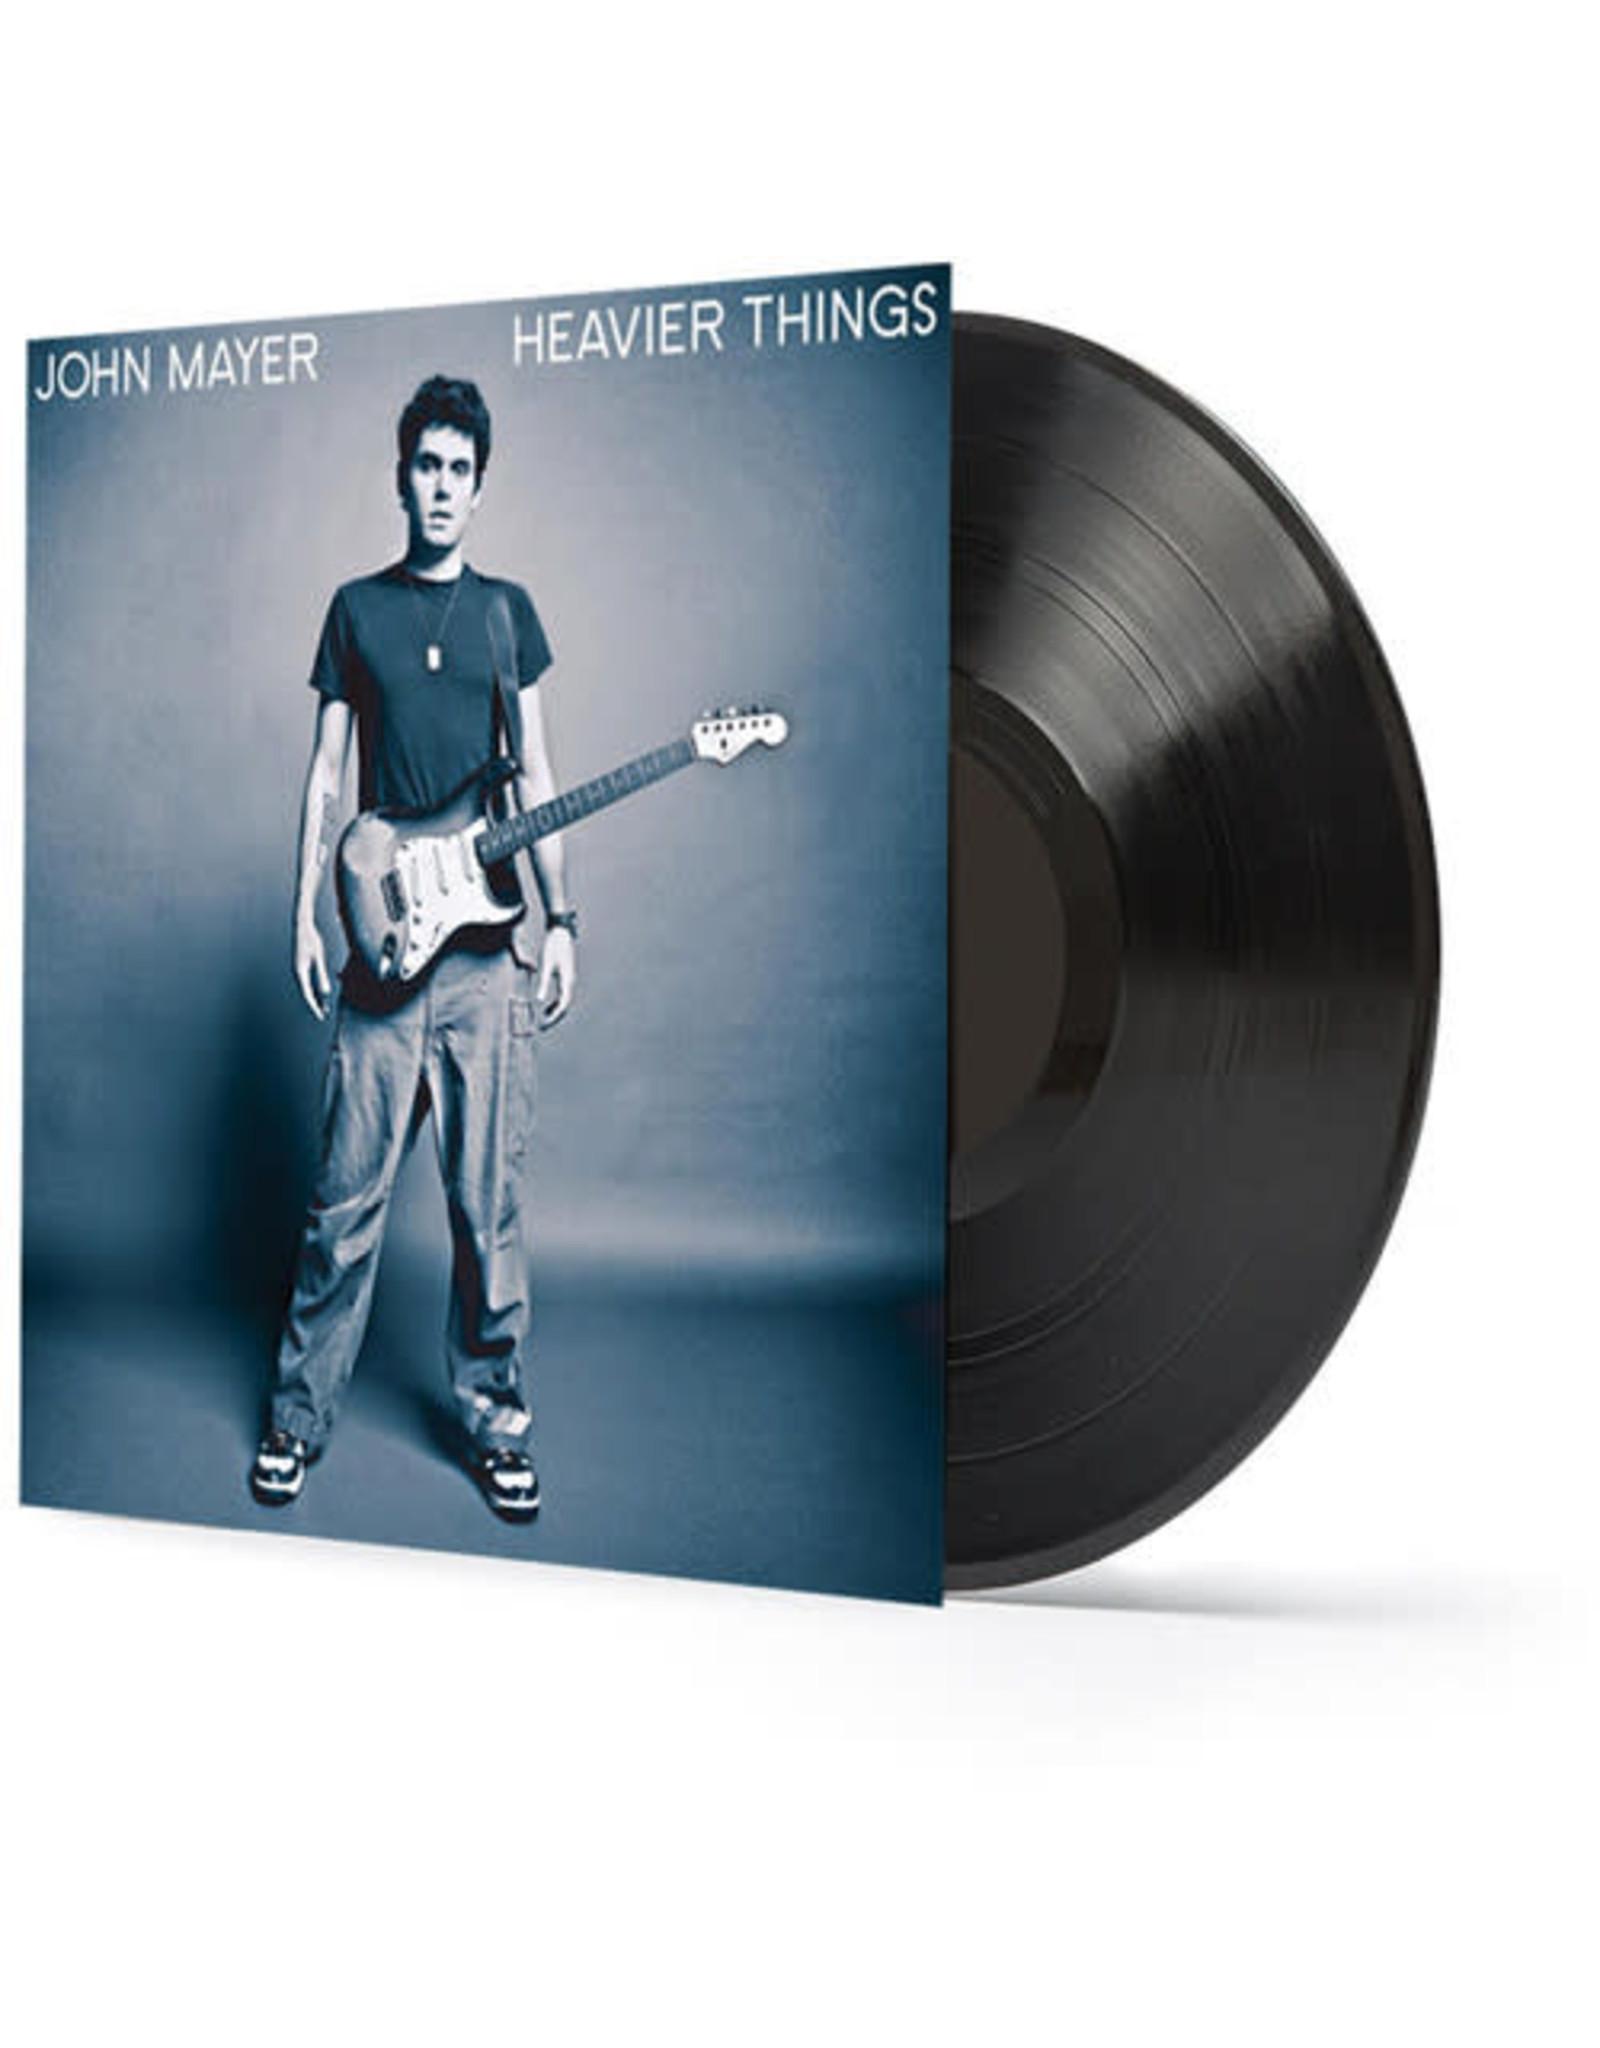 New Vinyl John Mayer - Heavier Things LP